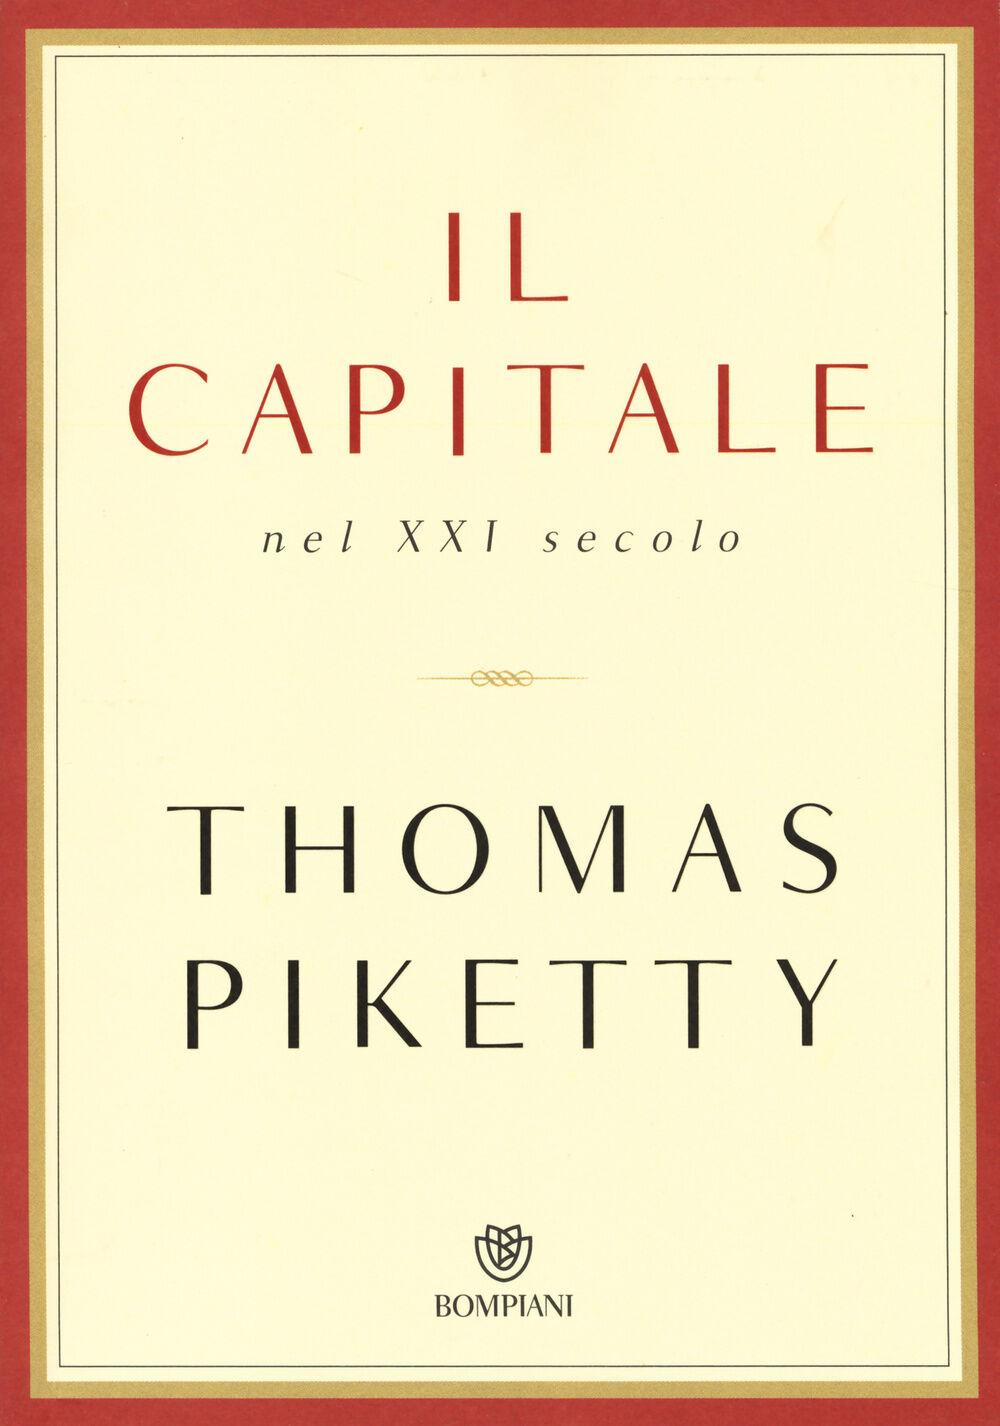 https://www.ibs.it/capitale-nel-xxi-secolo-libro-thomas-piketty/e/9788845277733